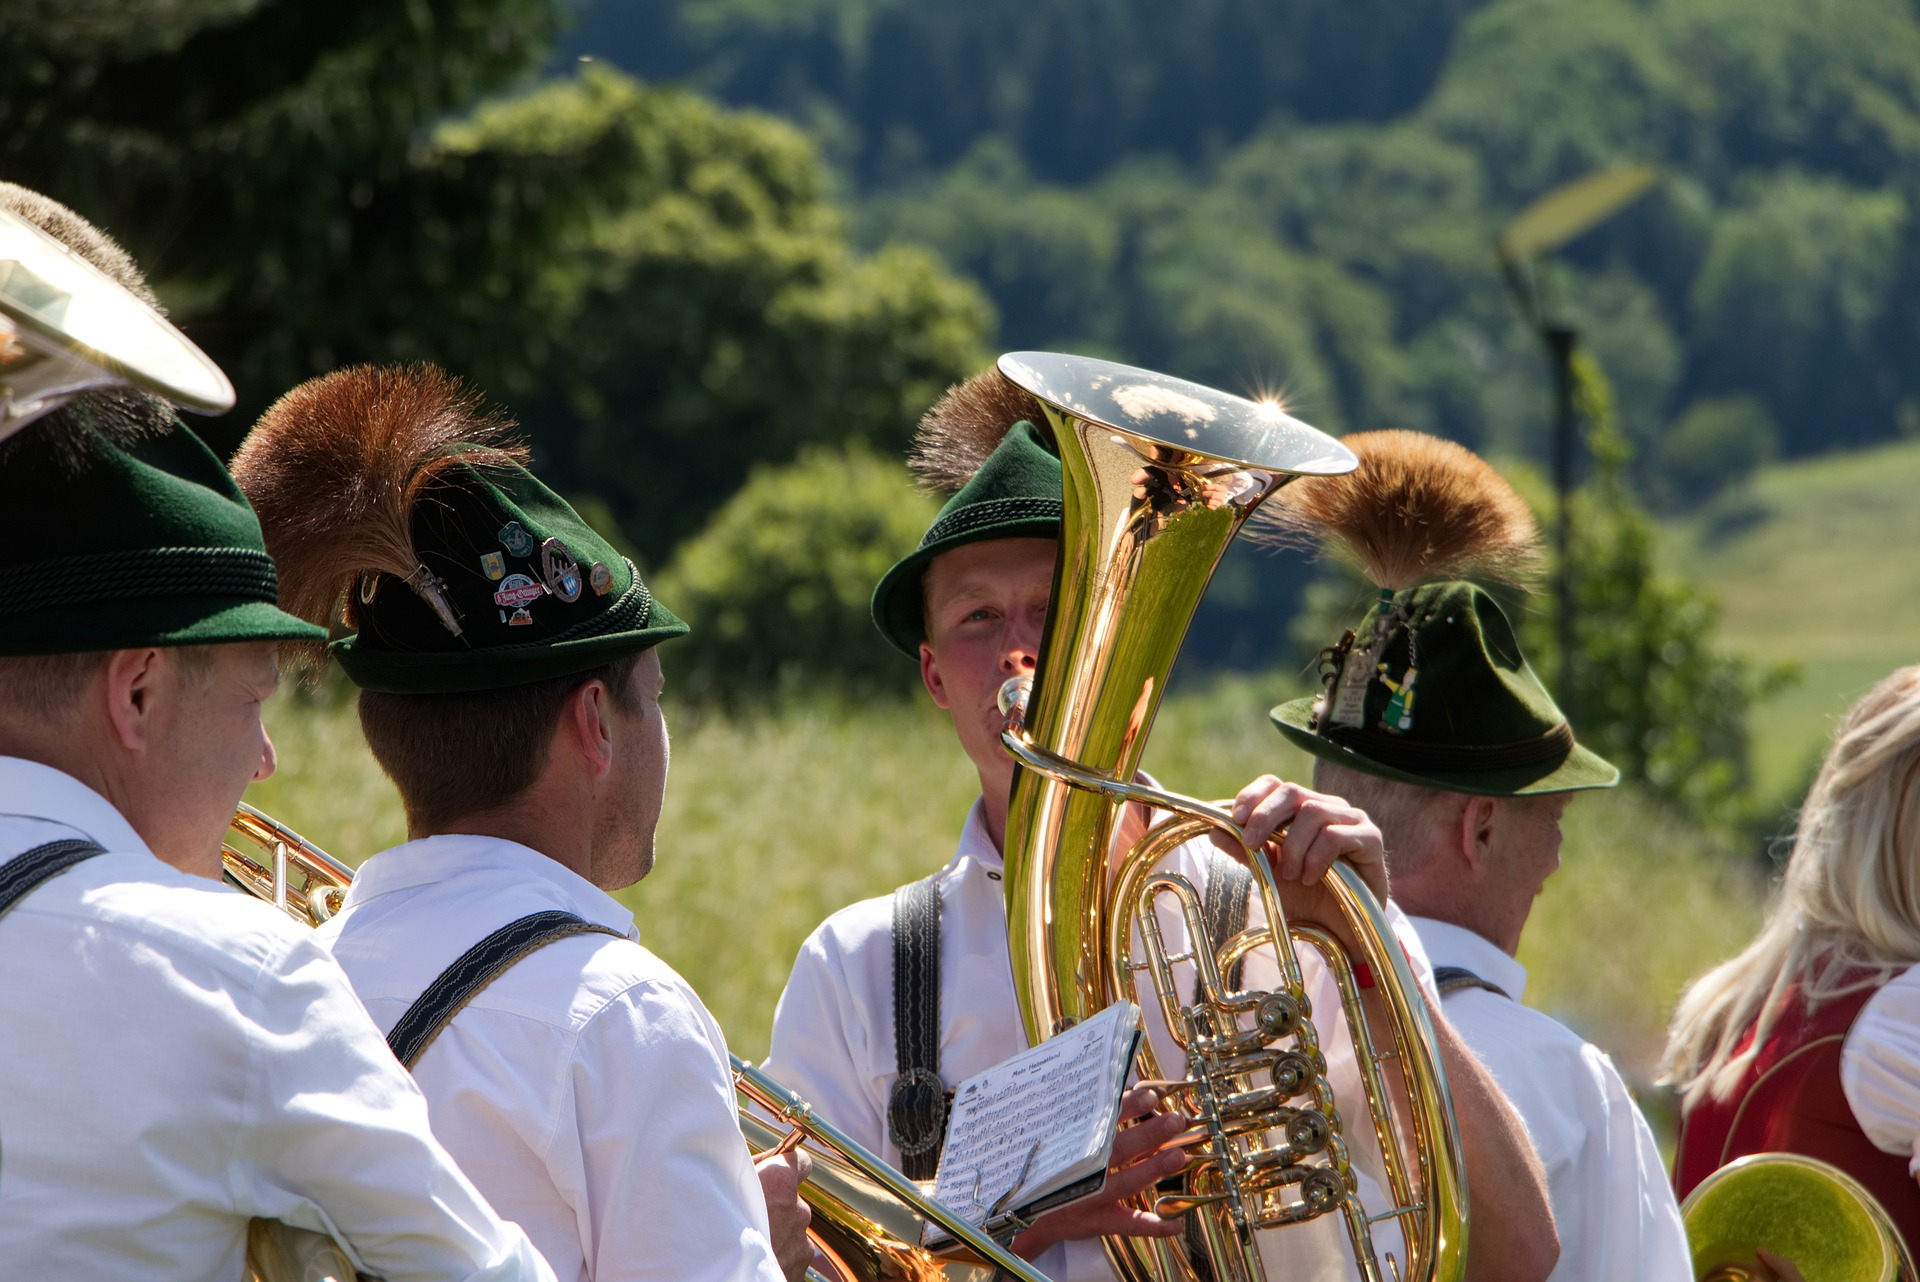 La musique folk